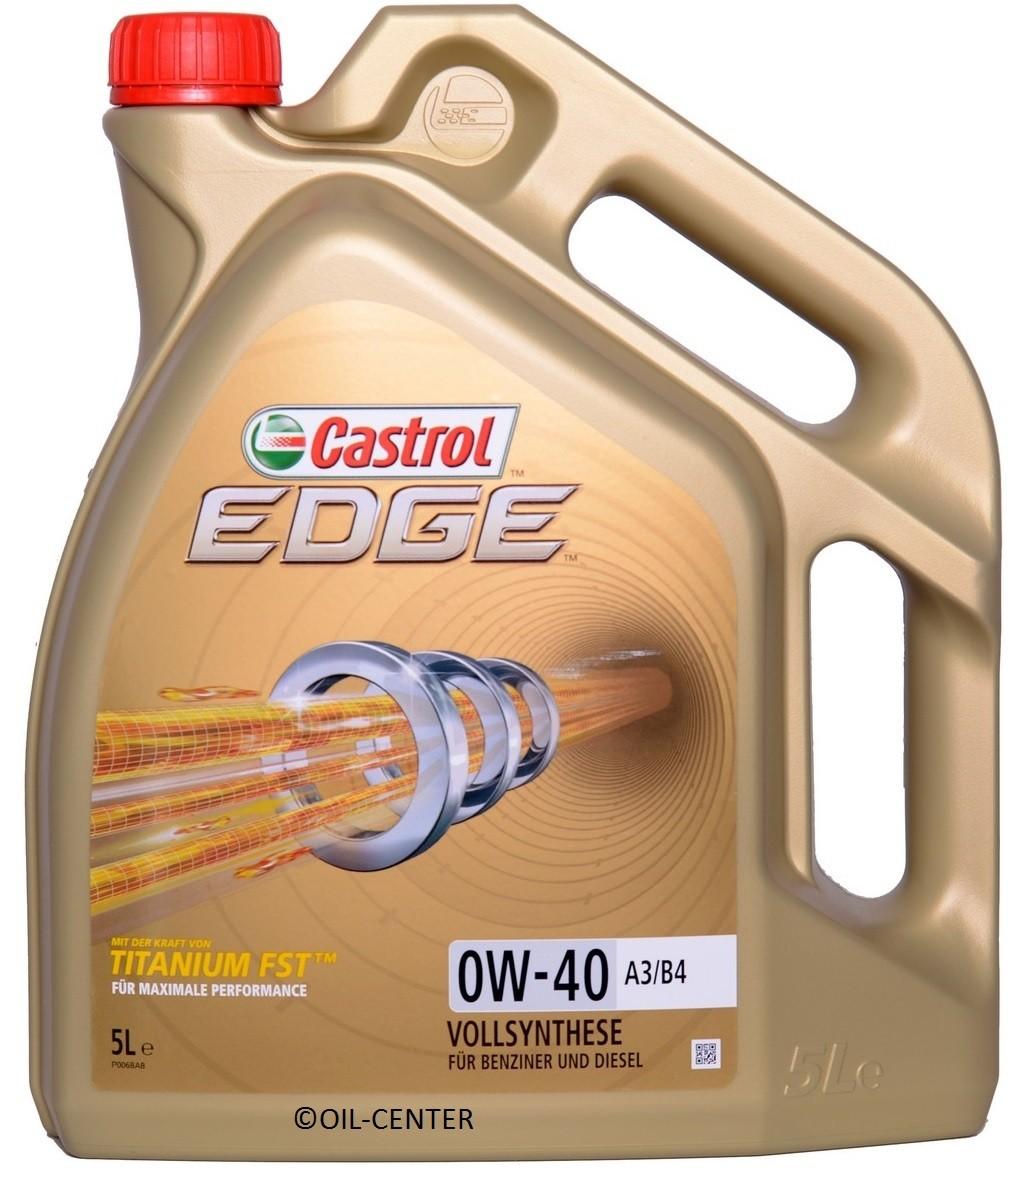 CASTROL OLEJ CASTROL 0W40 EDGE 4L 194350257